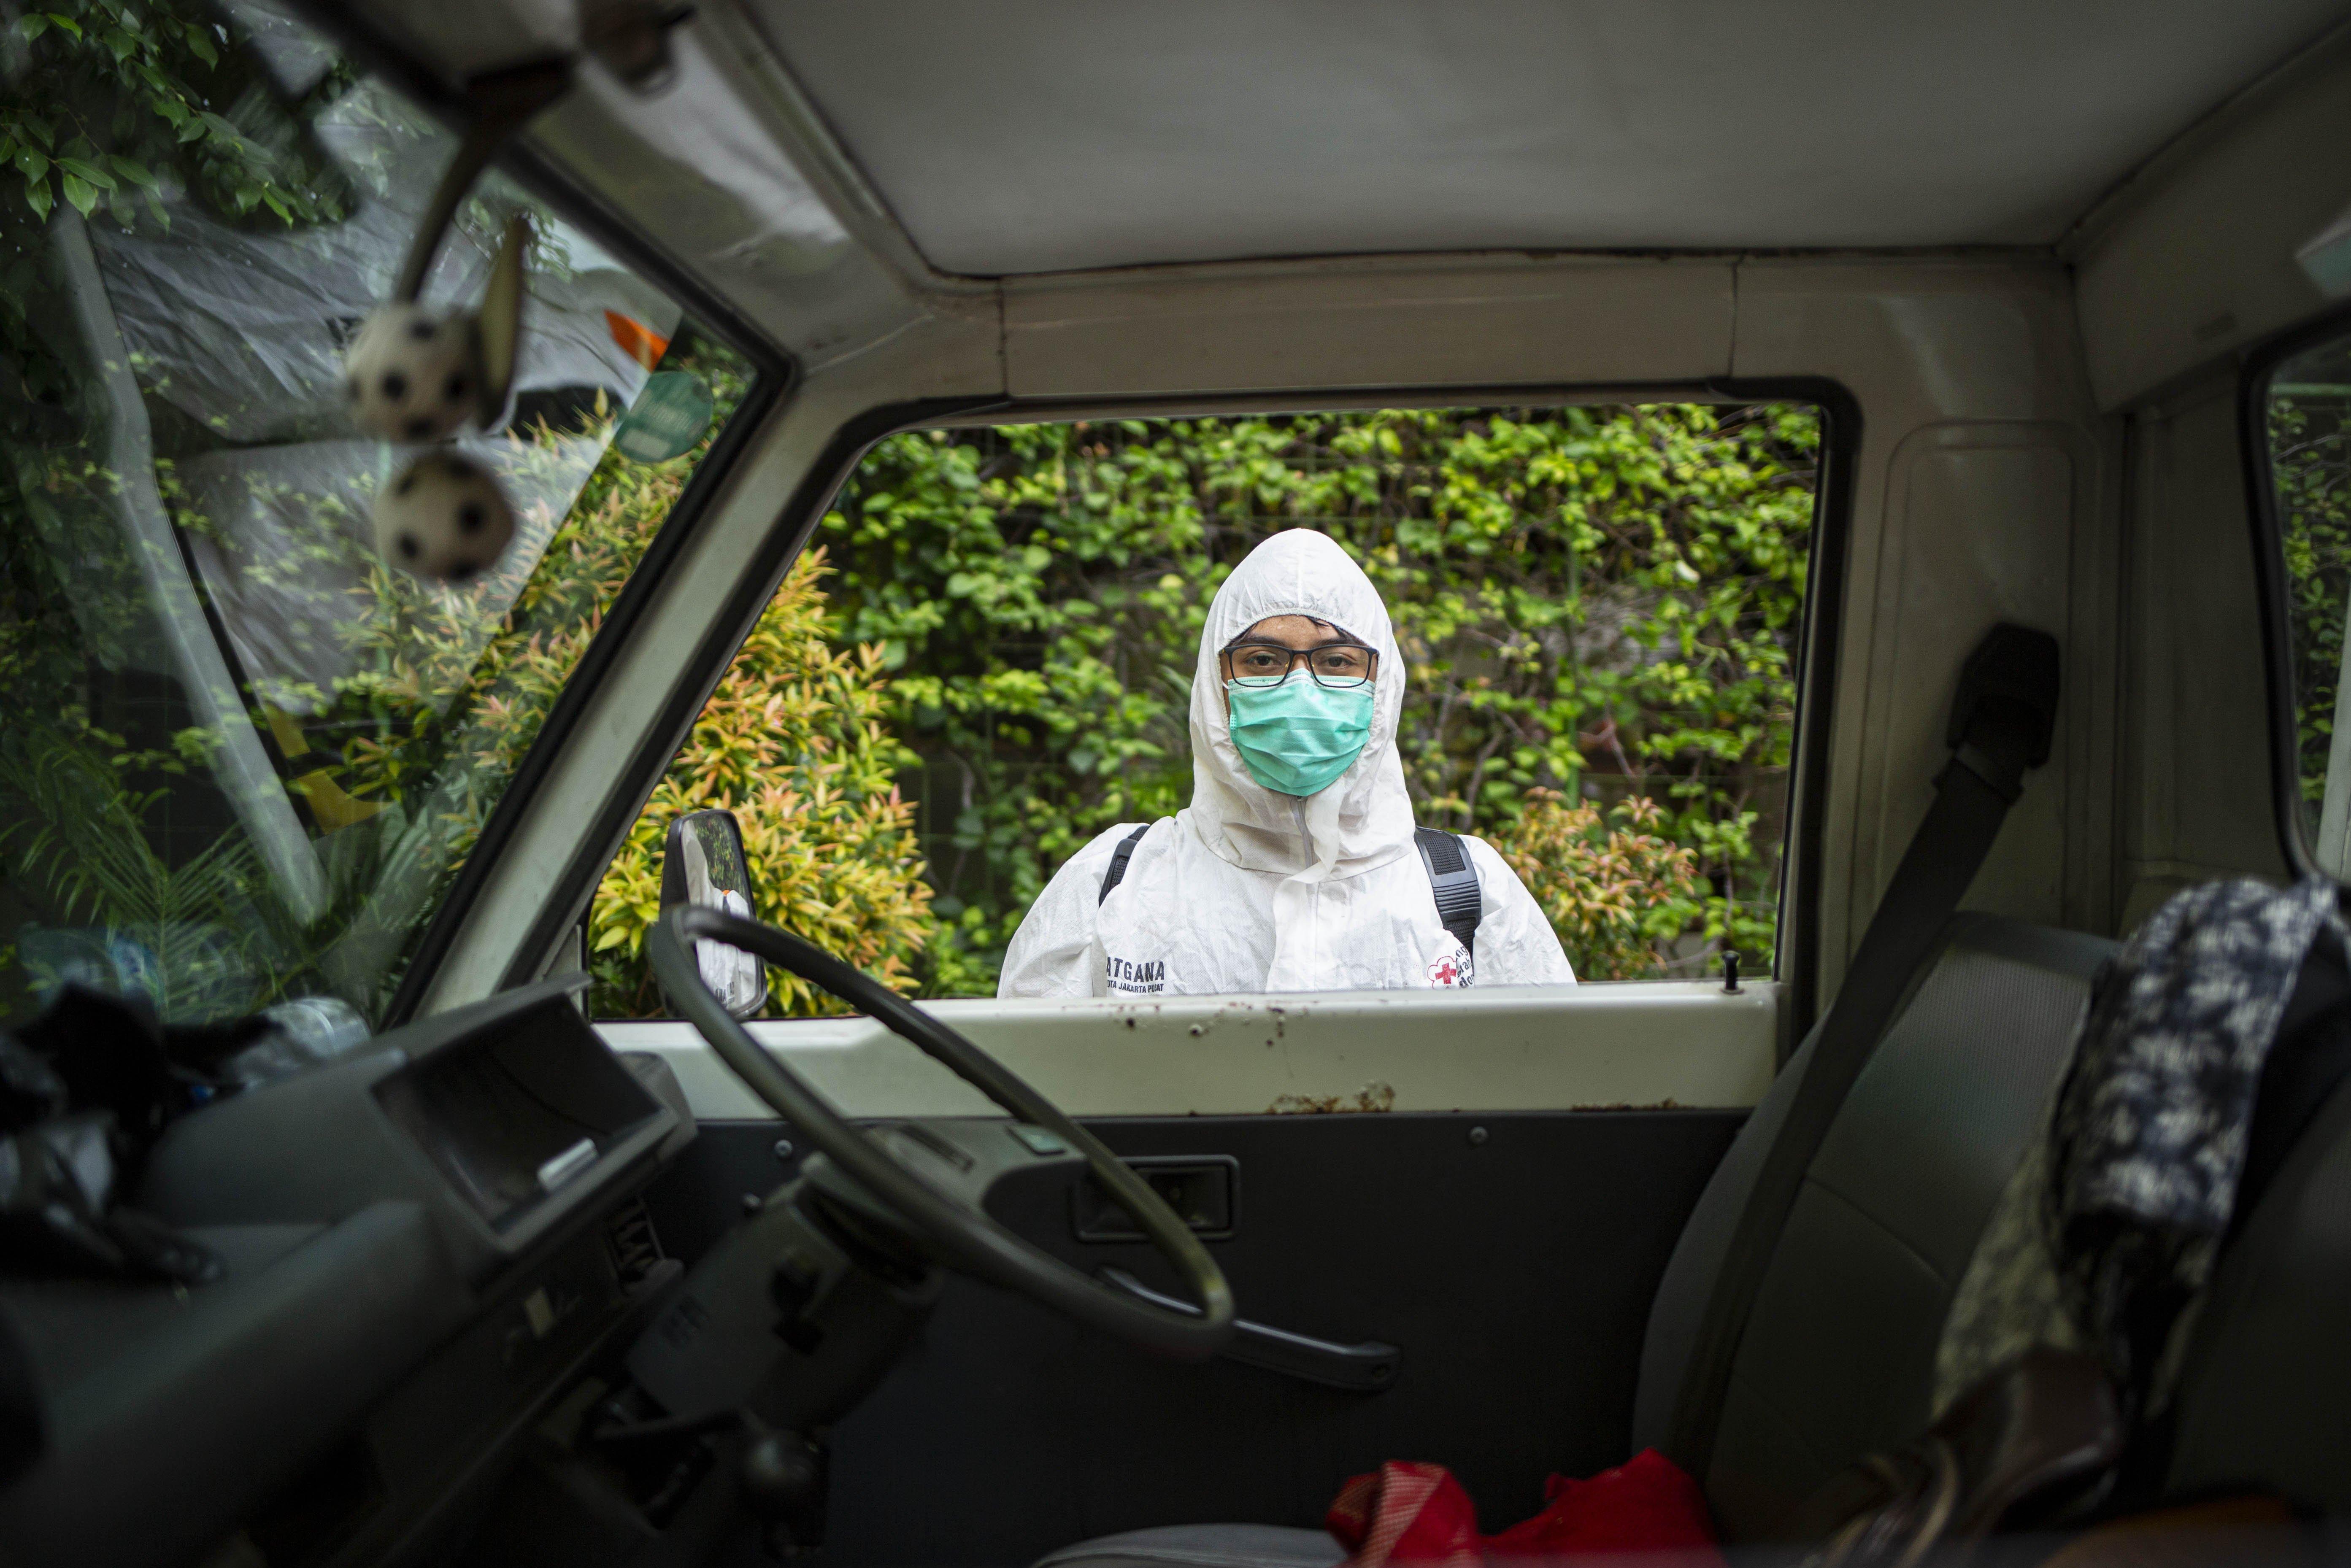 Petugas bersiap menyemprotkan disinfektan di Sekolah Dasar Negeri Kenari, Jakarta Pusat.